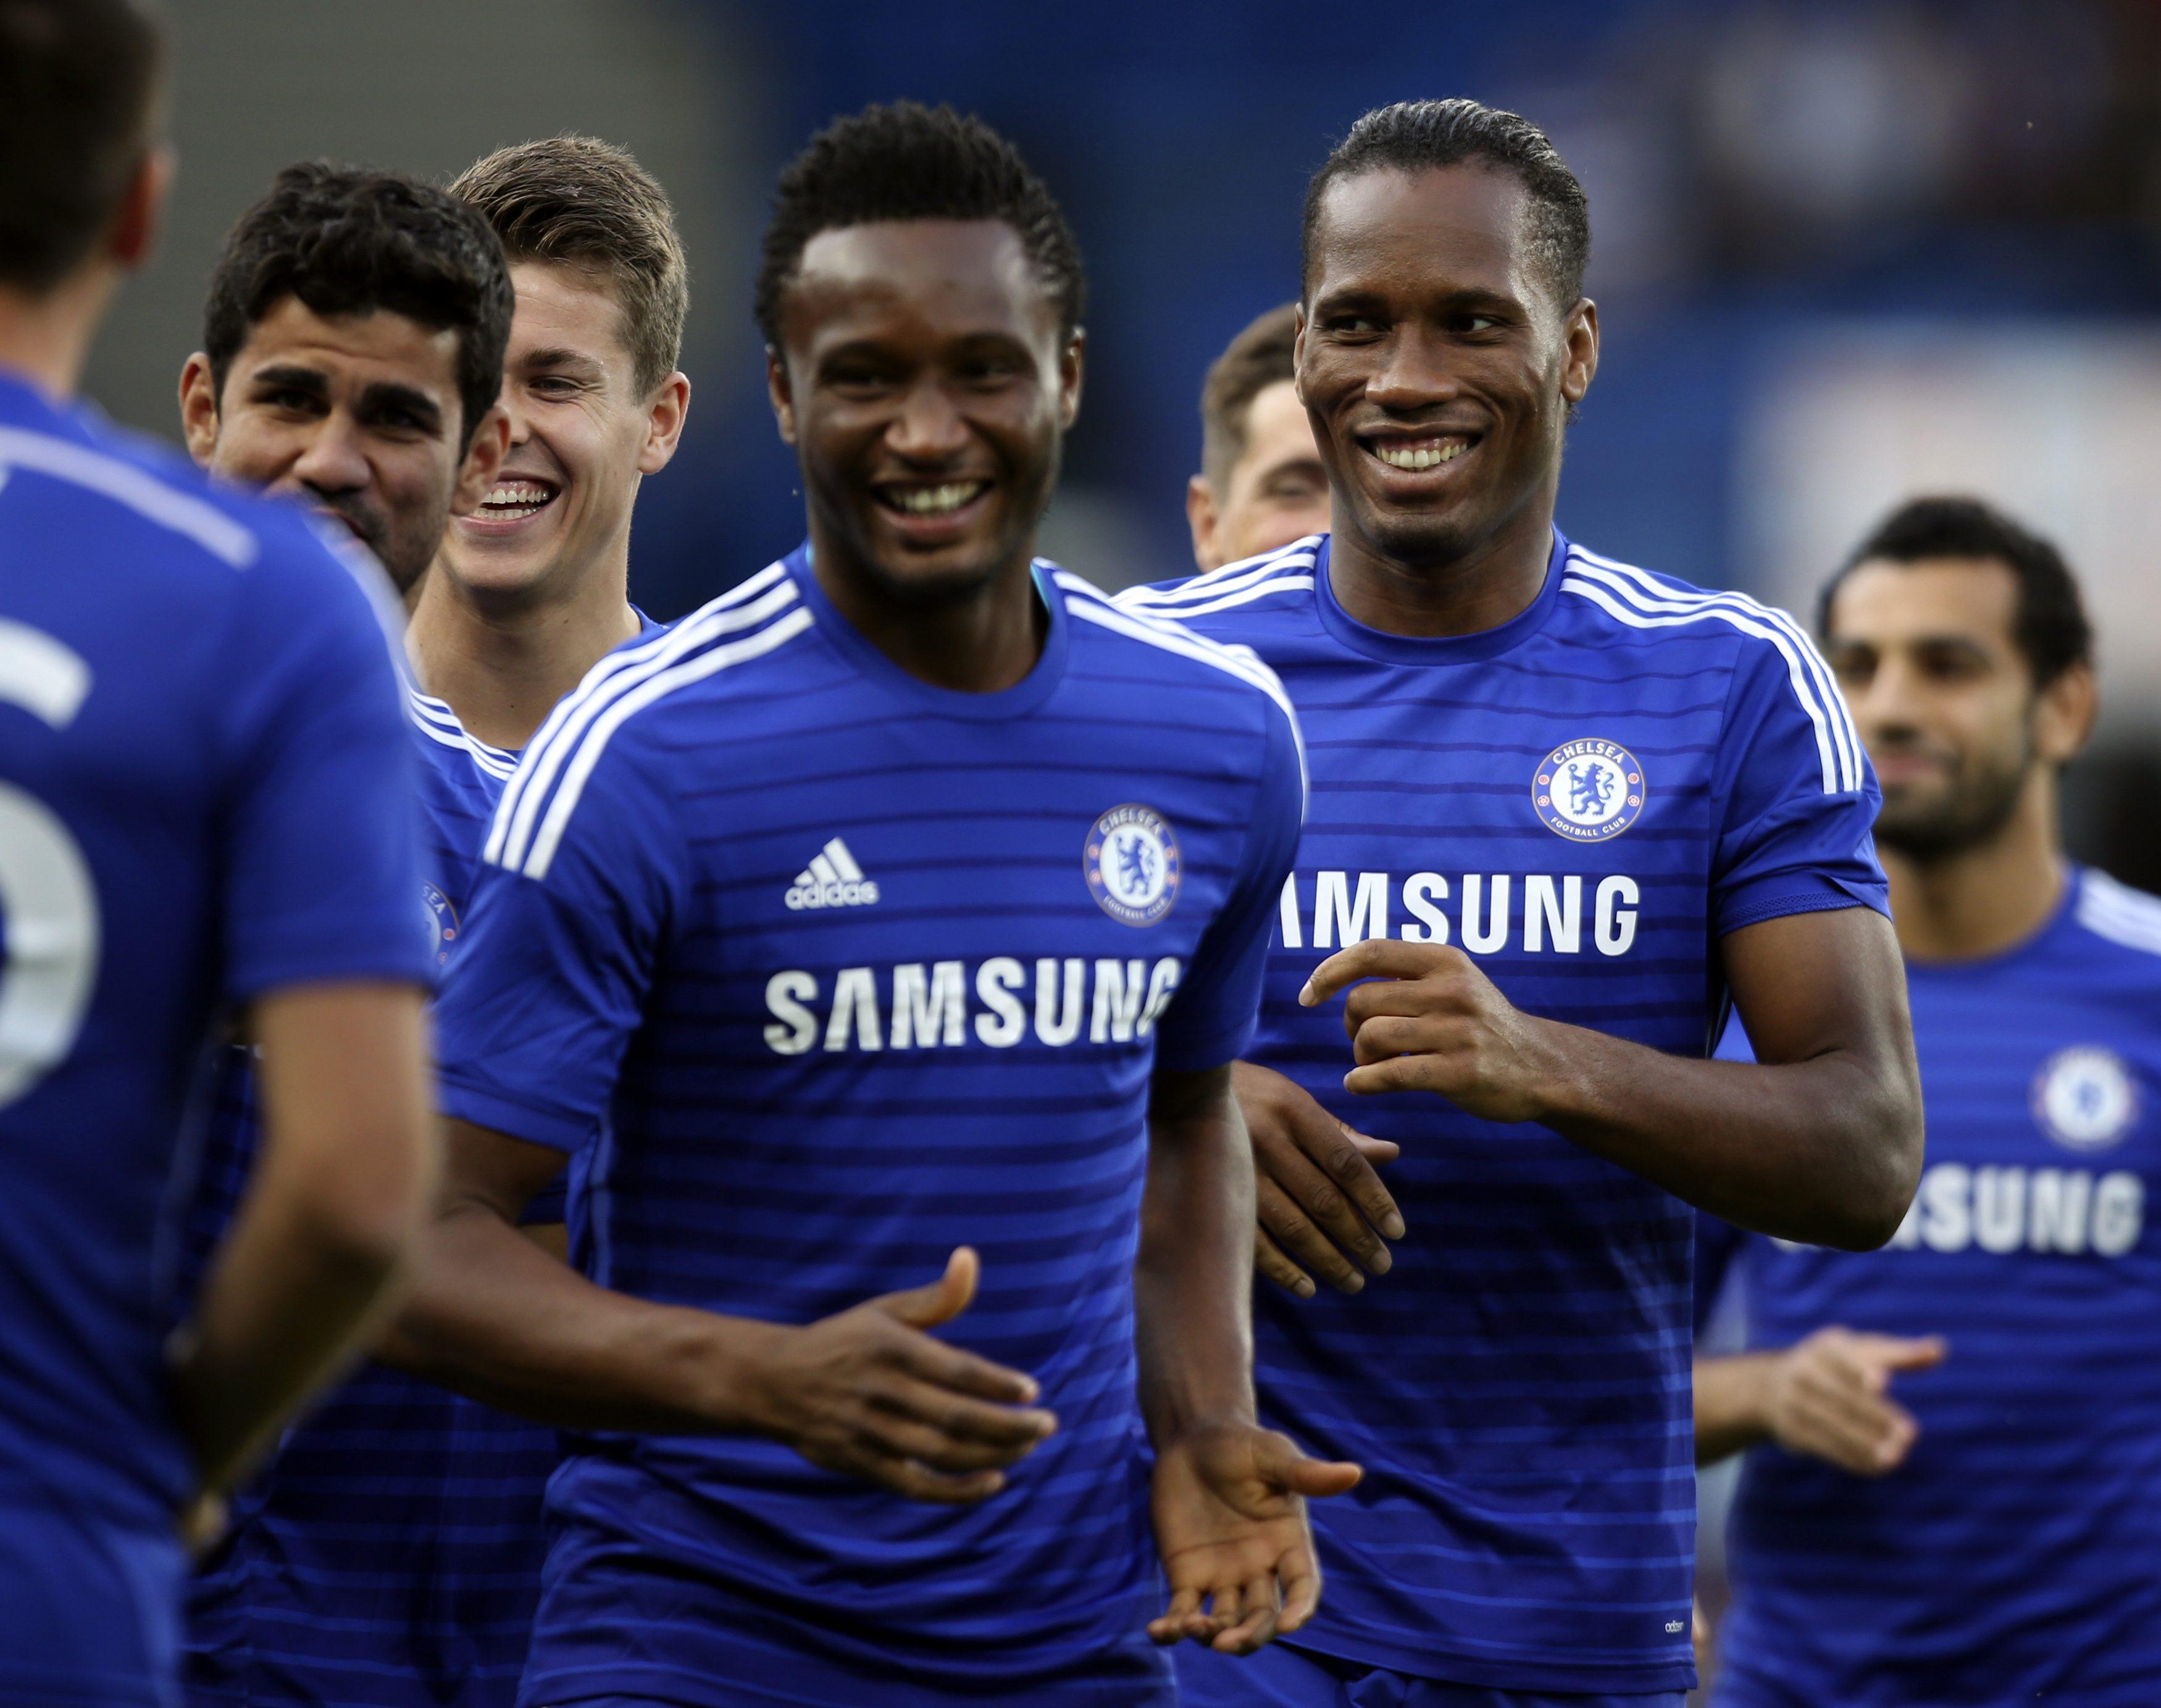 official photos 91c2f c9268 Oscar award helps Drogba get No 11 Chelsea shirt back   The ...